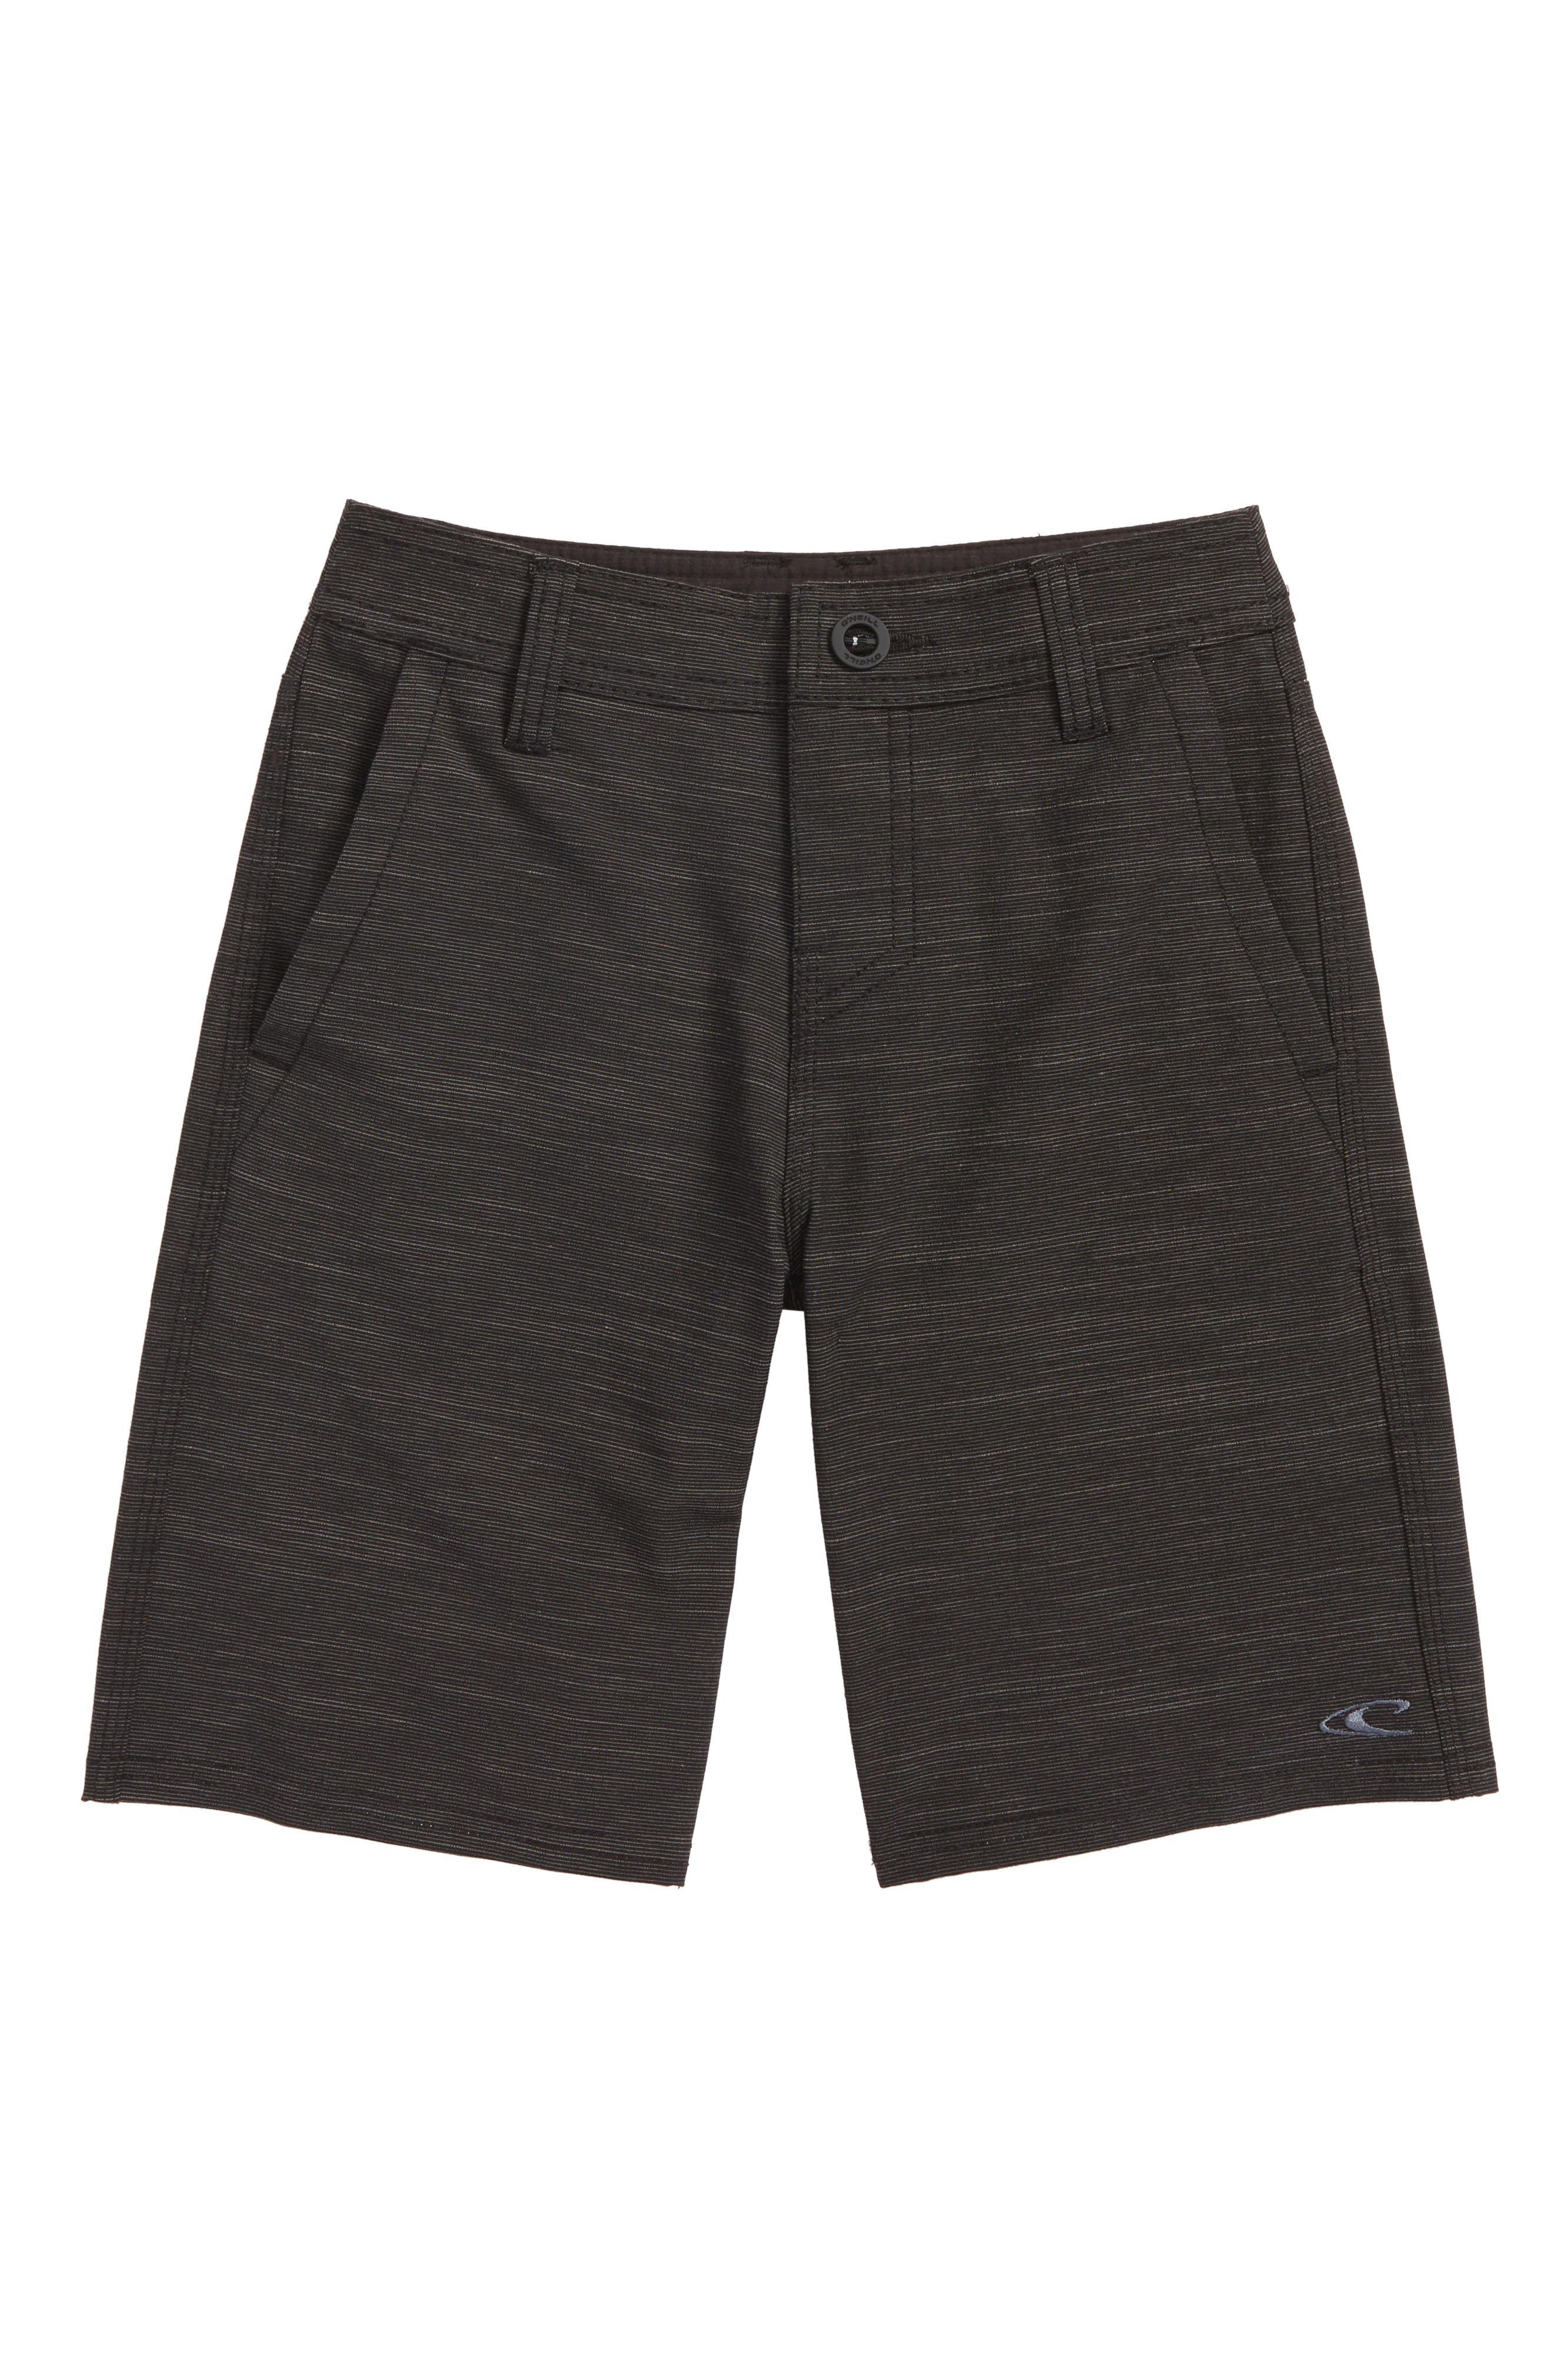 Locked Slub Hybrid Board Shorts,                         Main,                         color, 001